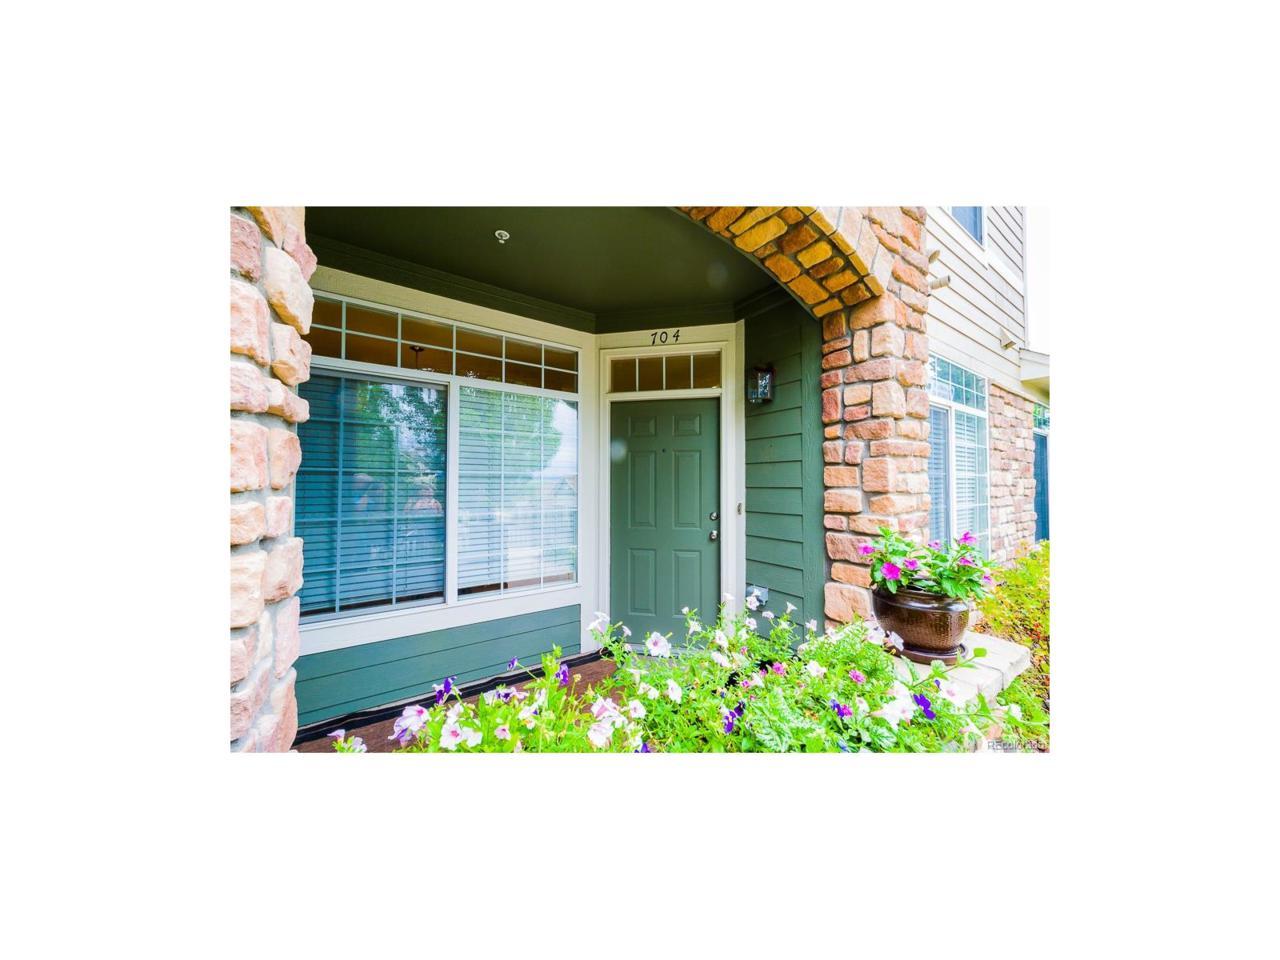 457 Black Feather Loop #704, Castle Rock, CO 80104 (MLS #3818652) :: 8z Real Estate